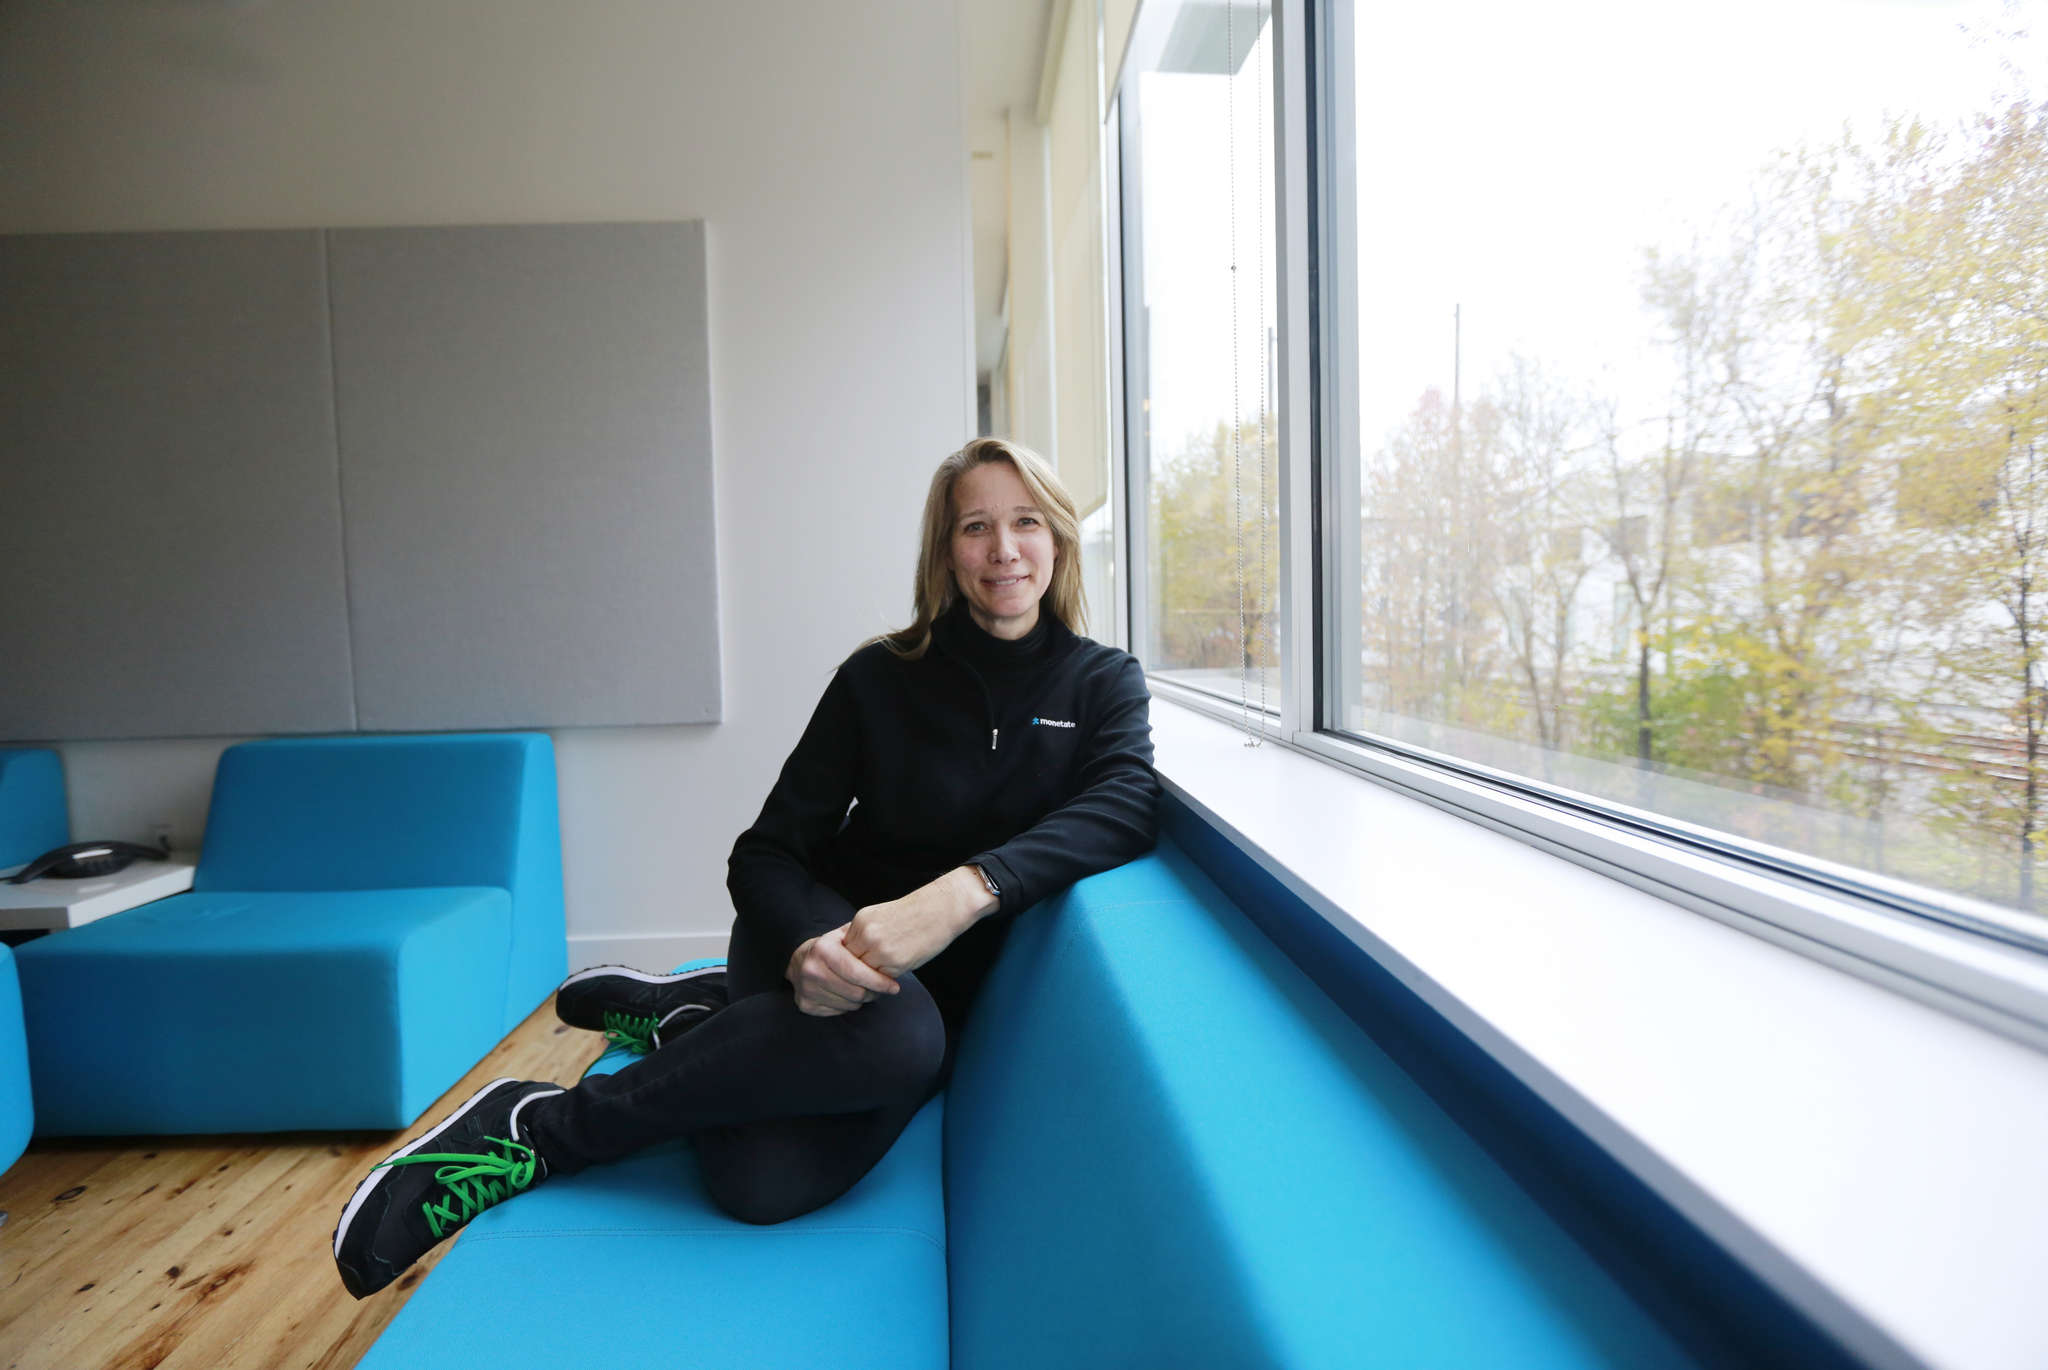 Lucinda Duncalfe´s Conshohocken-based start-up, Monetate, has offices in Palo Alto, Calif., and London.